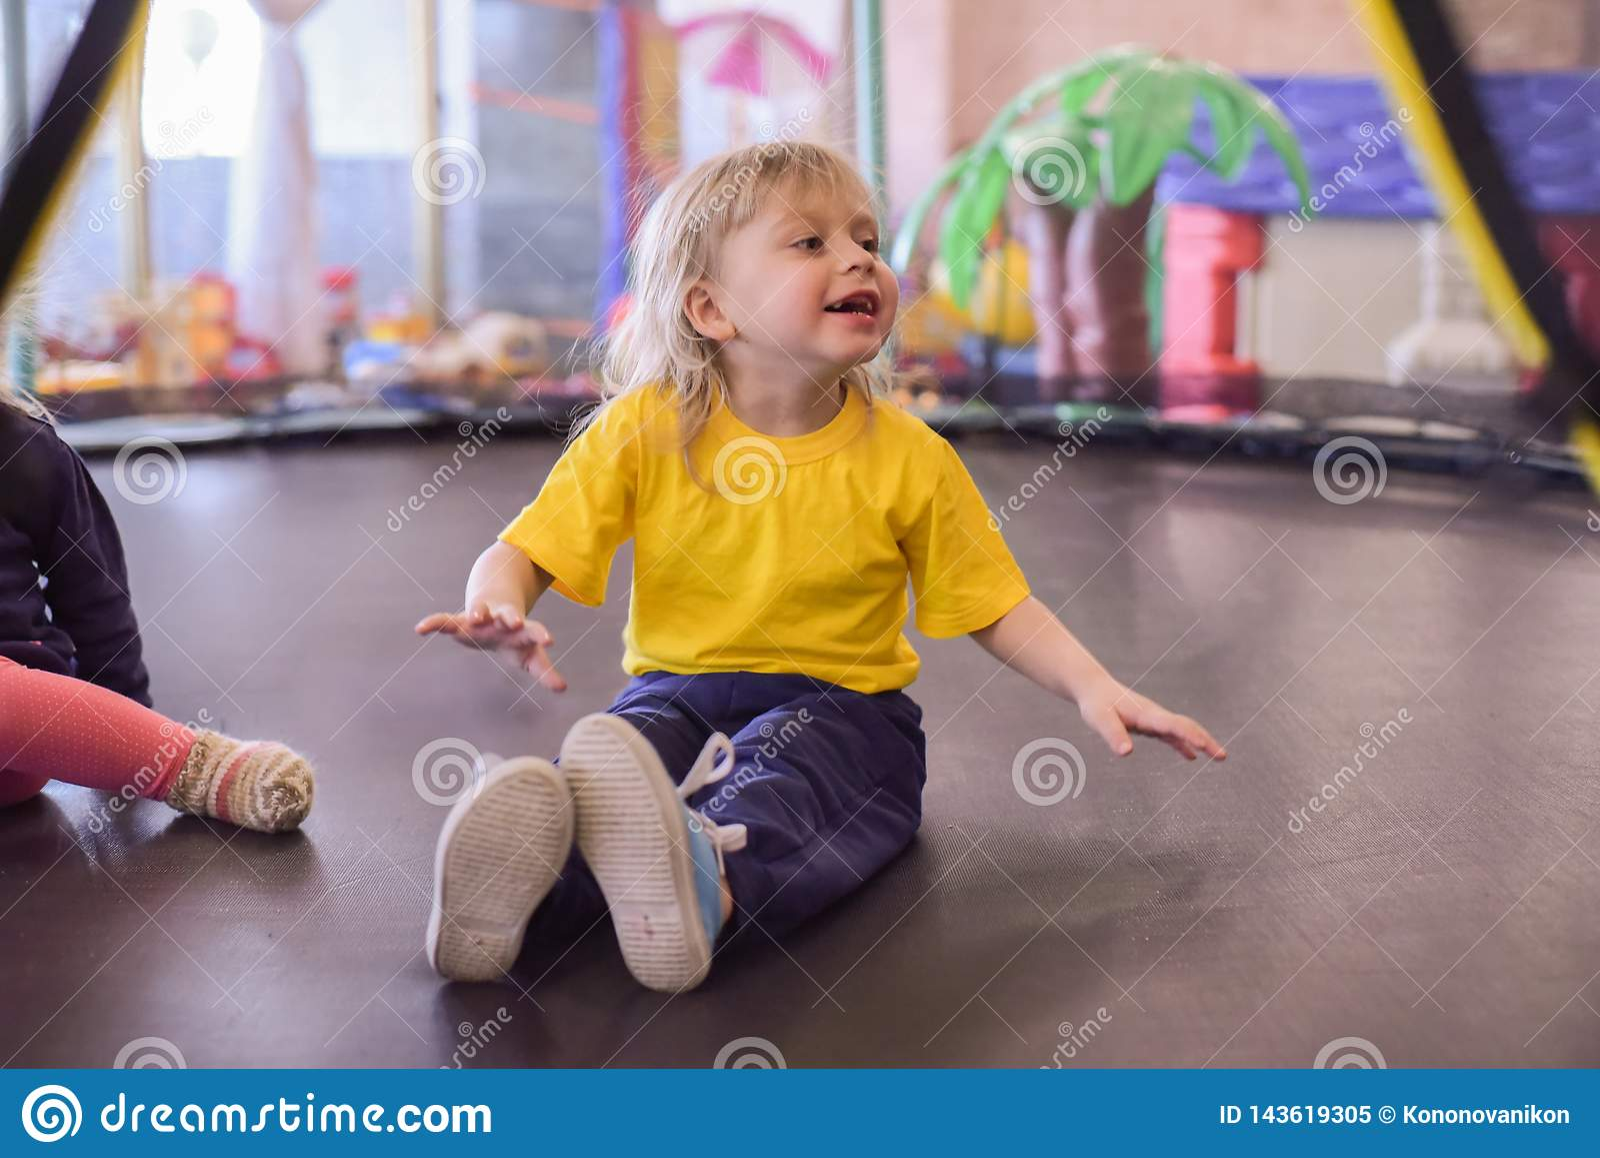 Stående av en blond pojke i en gul t-skjorta De barnleendena och lekarna i barnens lekrum Barnet hoppar på